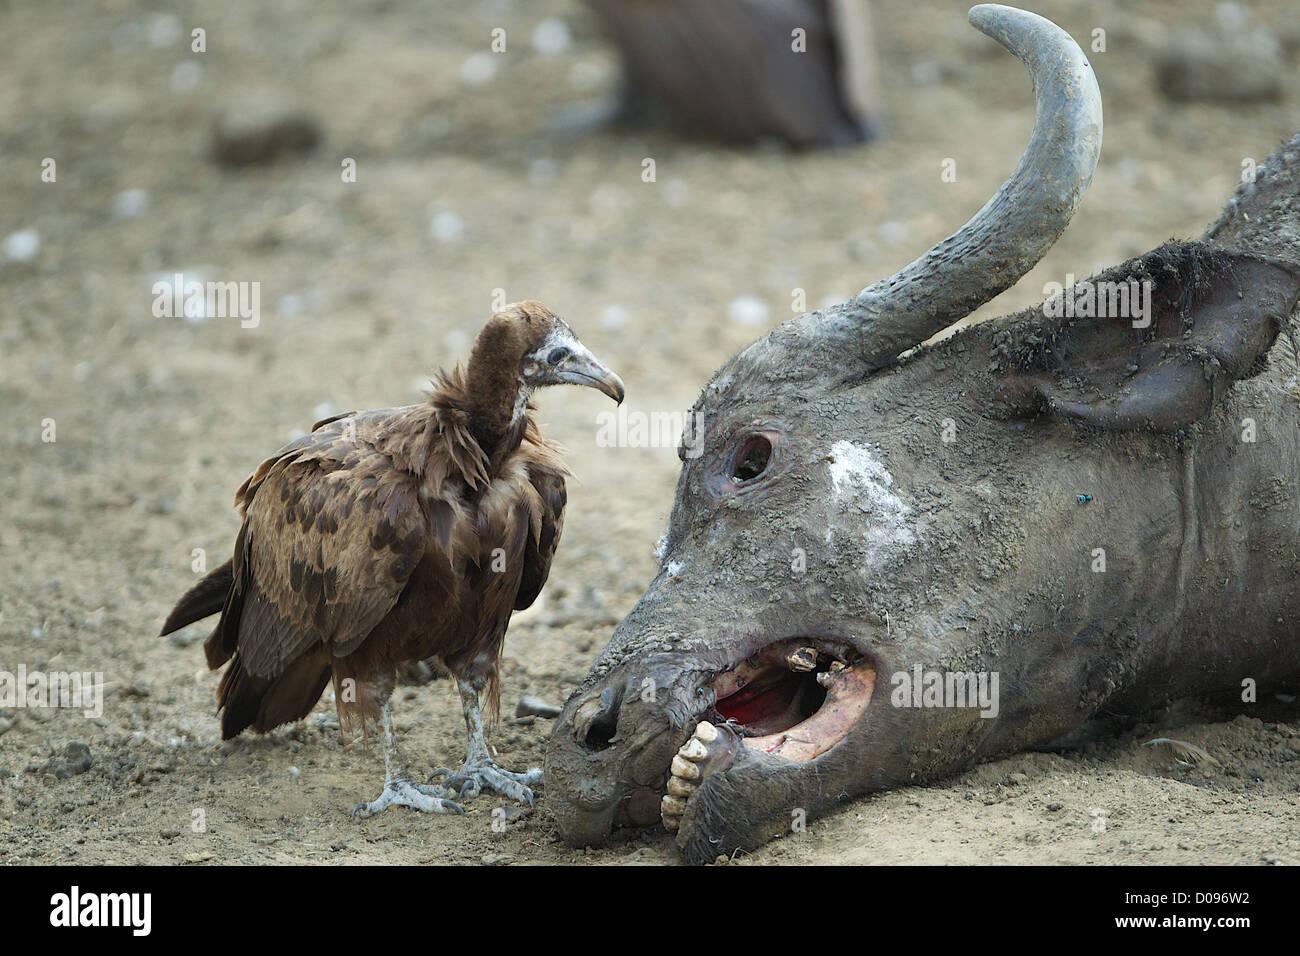 Geier sieht in Augenhöhle der Kaffernbüffel Karkasse Mikumi Wildreservat. Südlichen Tansania. Afrika Stockbild